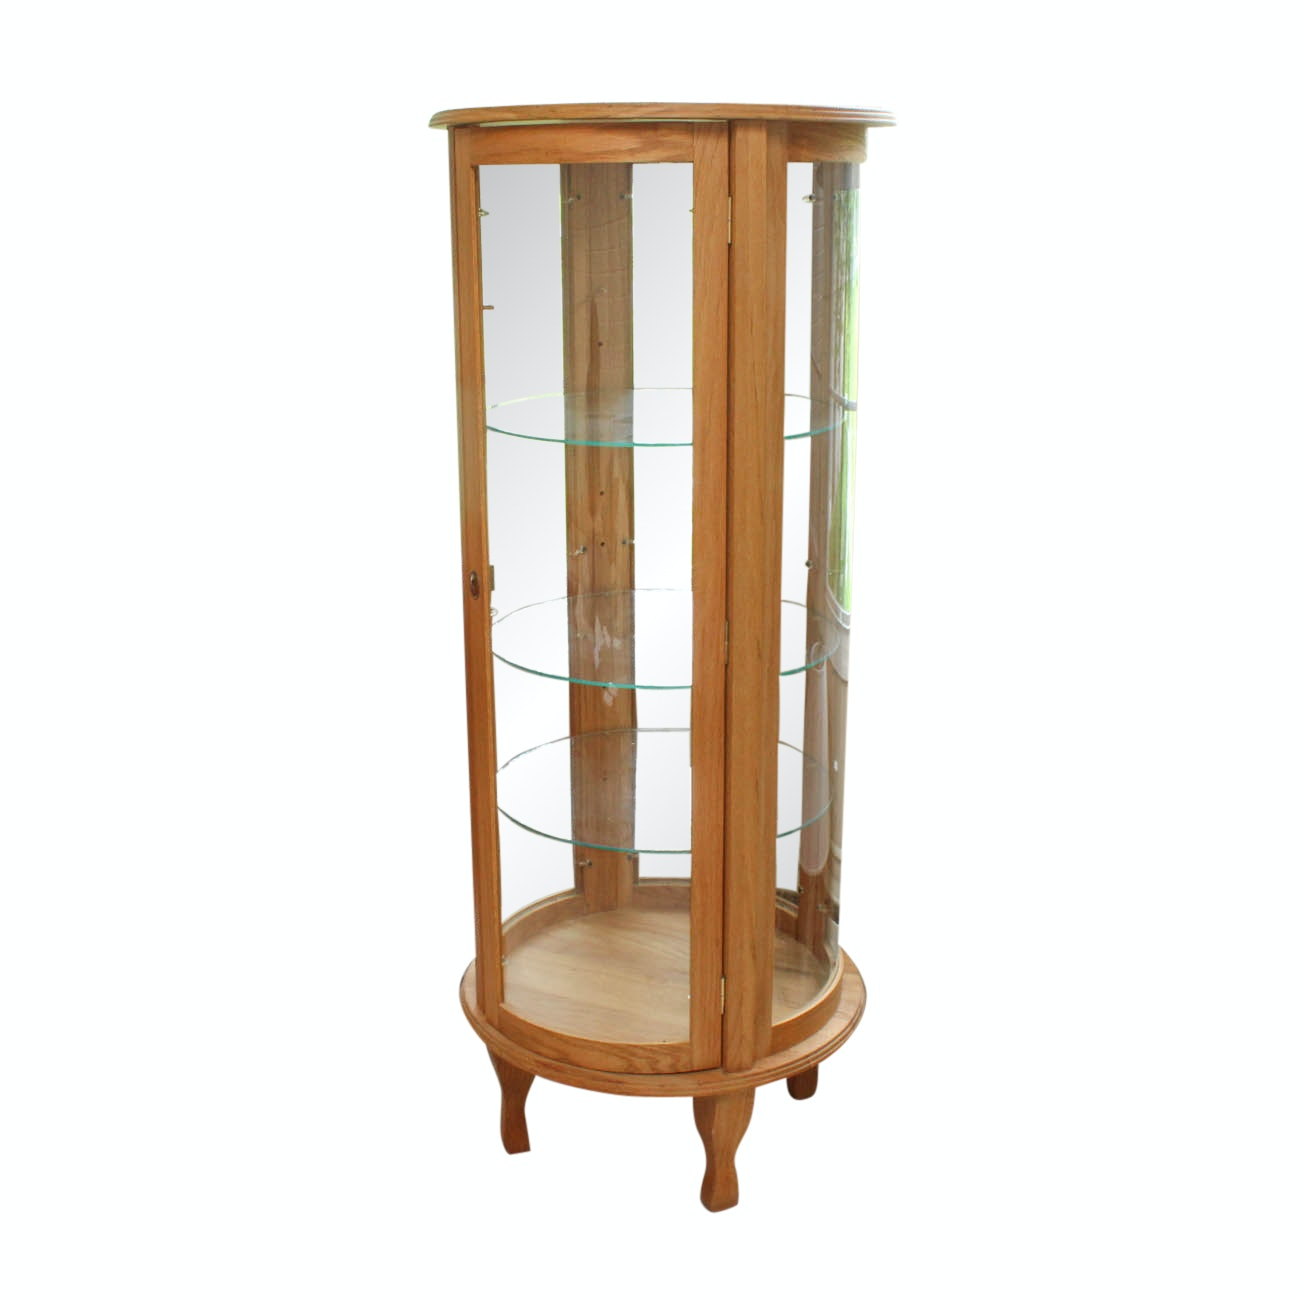 Illuminated Circular Oak Curio Cabinet